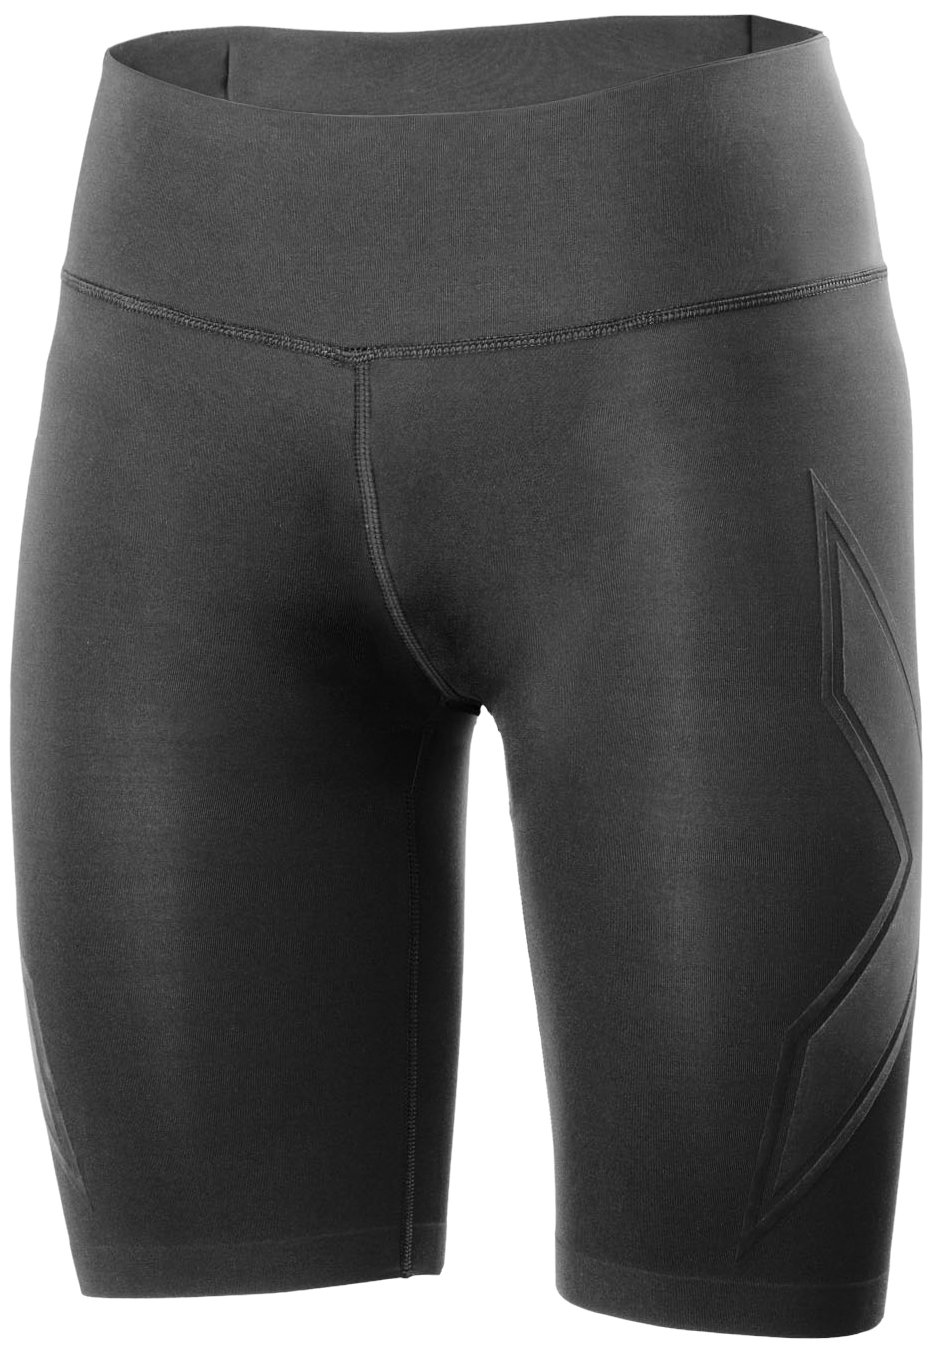 2XU Women's XTRM Compression Shorts, Large, Black/Scarlet